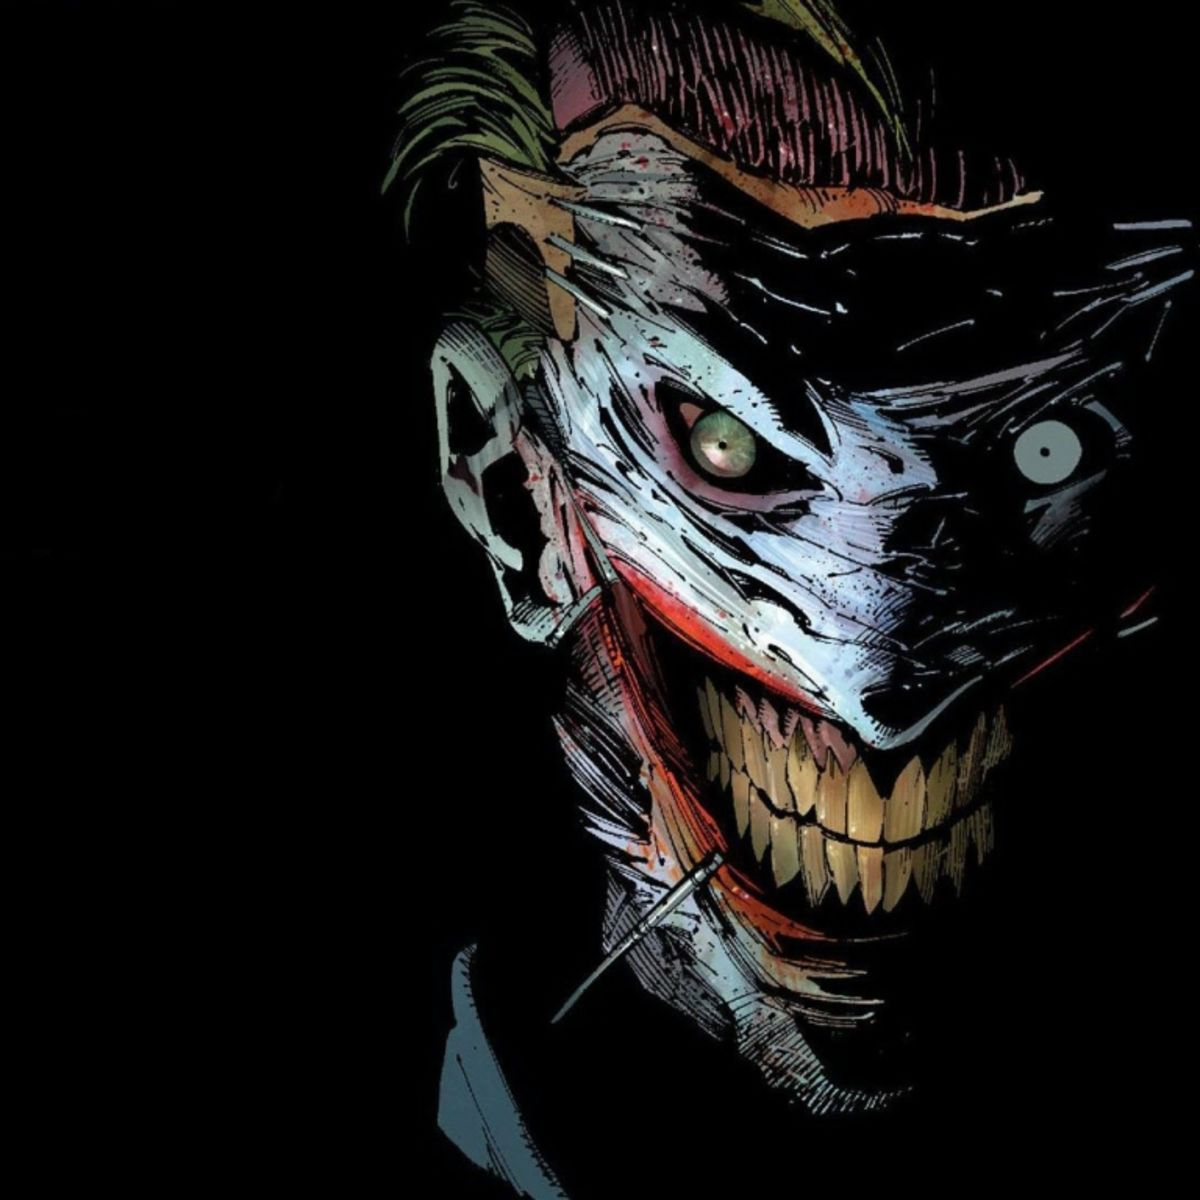 Dc-Comics-The-Joker-Masks-Smiling-1366x768.jpg